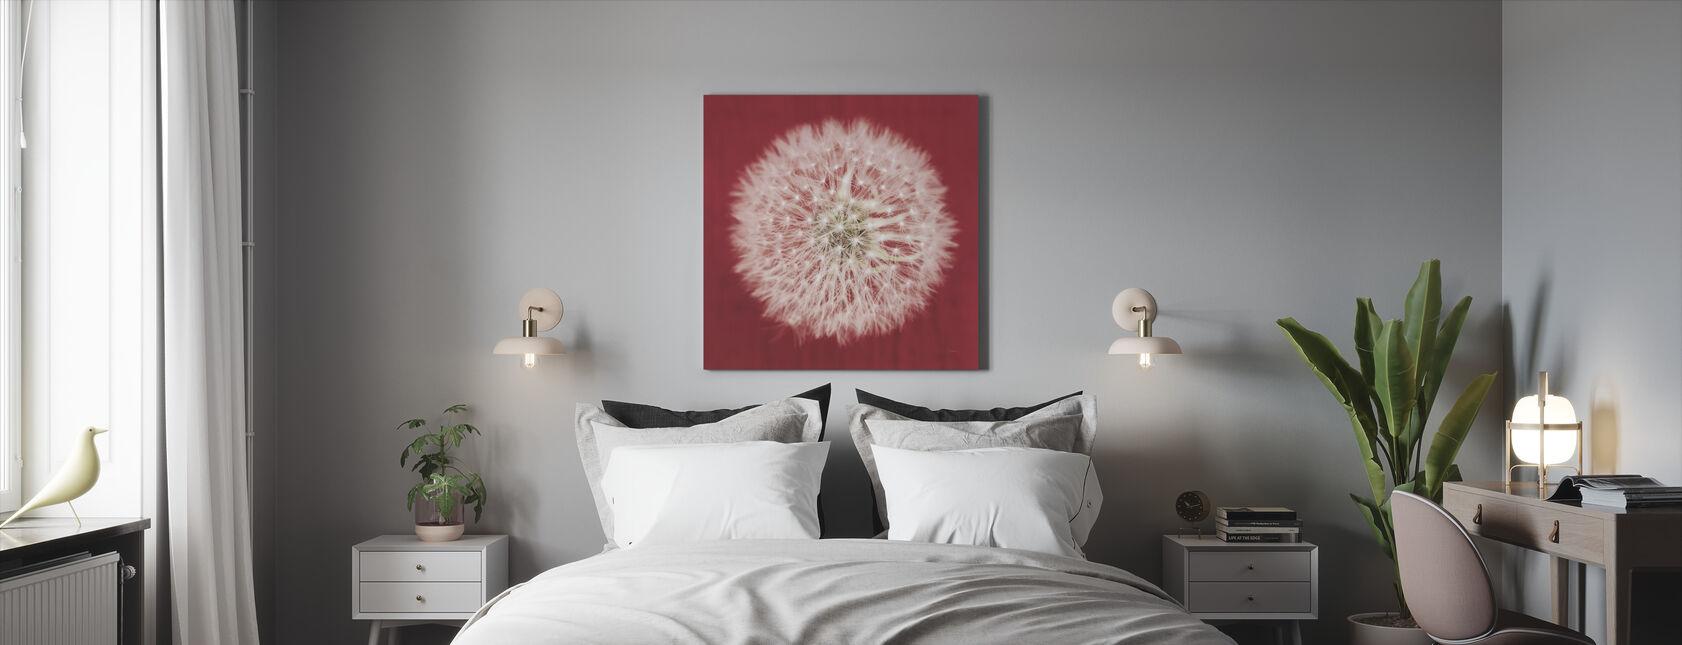 Dandelion on Red - Canvas print - Bedroom